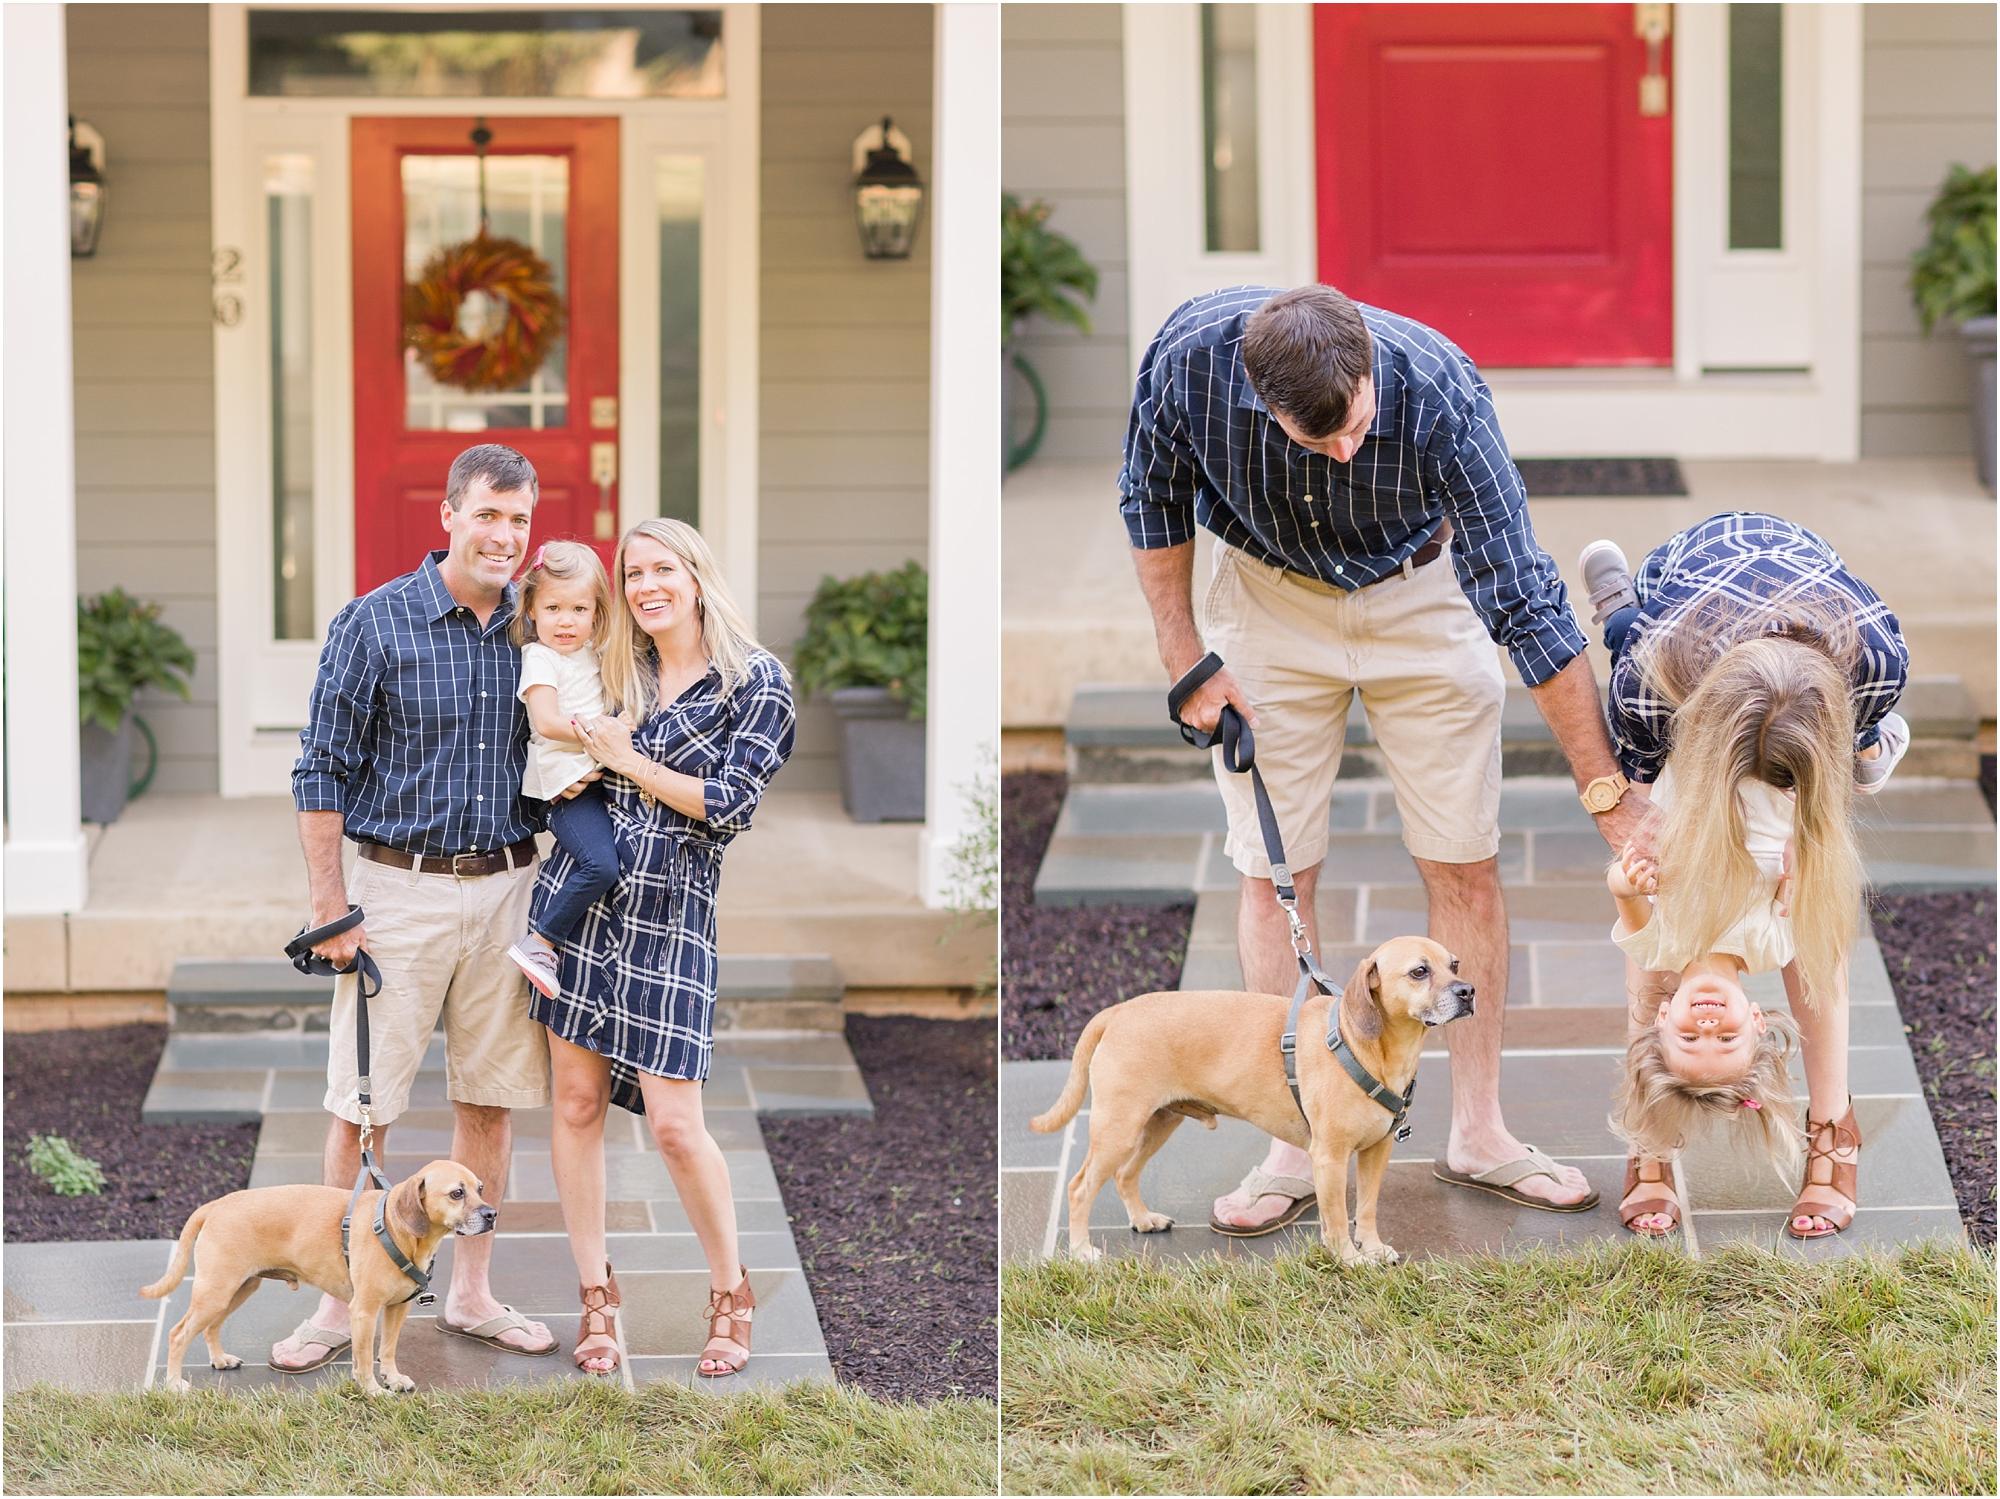 Ryan Family 2016-8_anna grace photography baltimore maryland family photographer photo.jpg